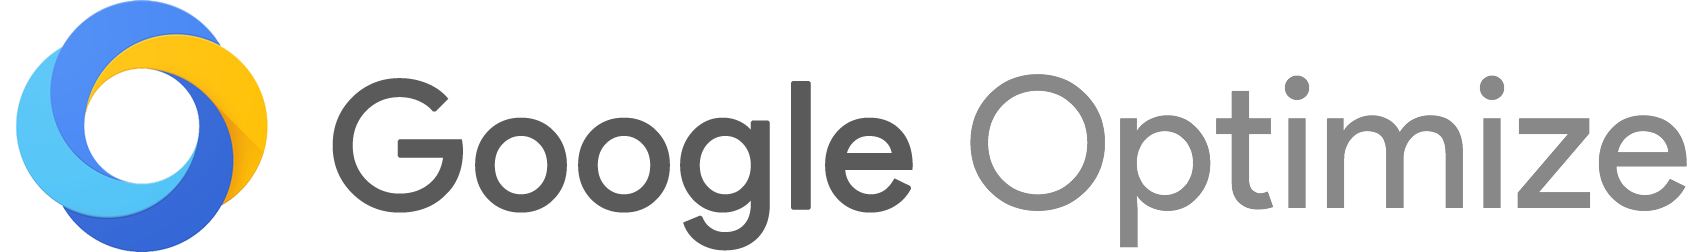 Google Optimize 360